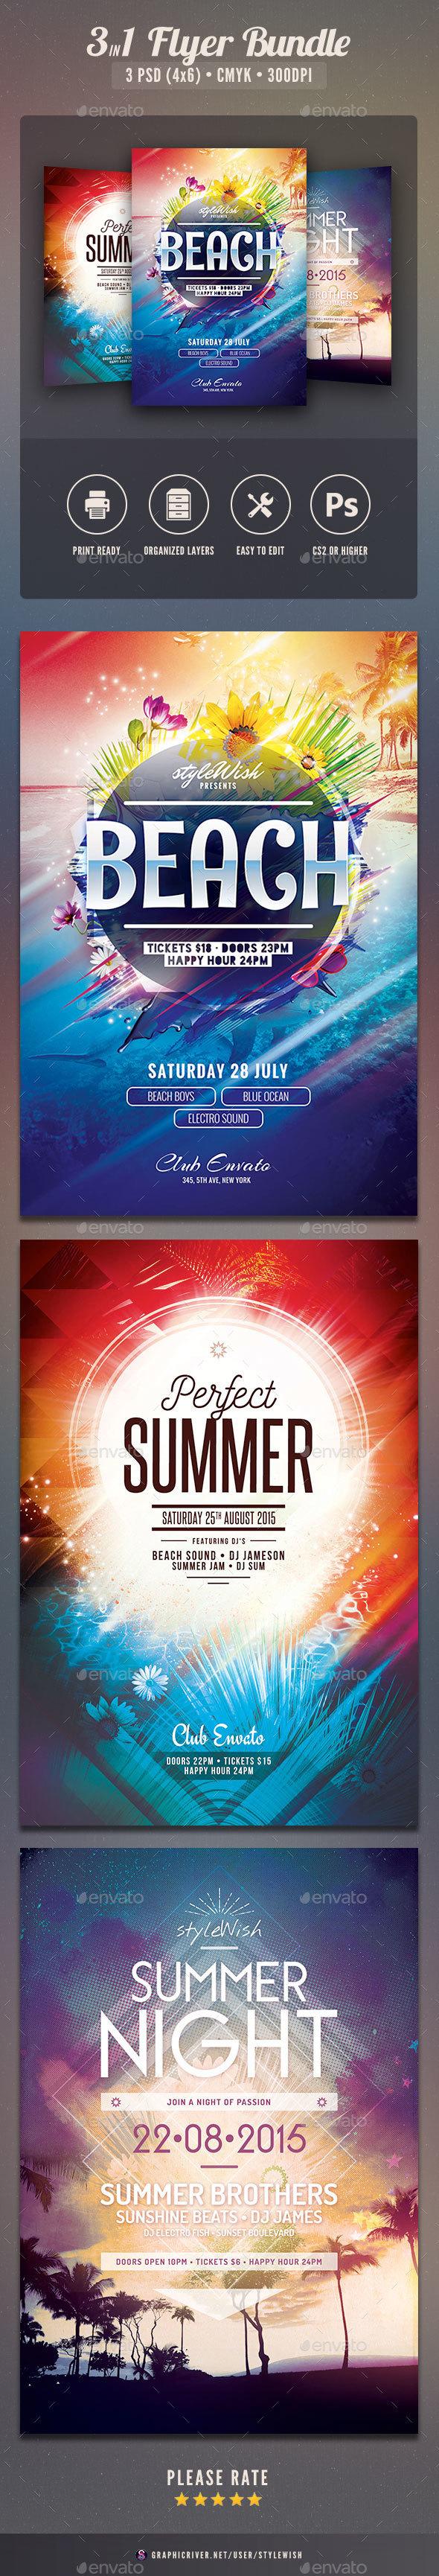 Summer Flyer Bundle Vol.10 - Clubs & Parties Events